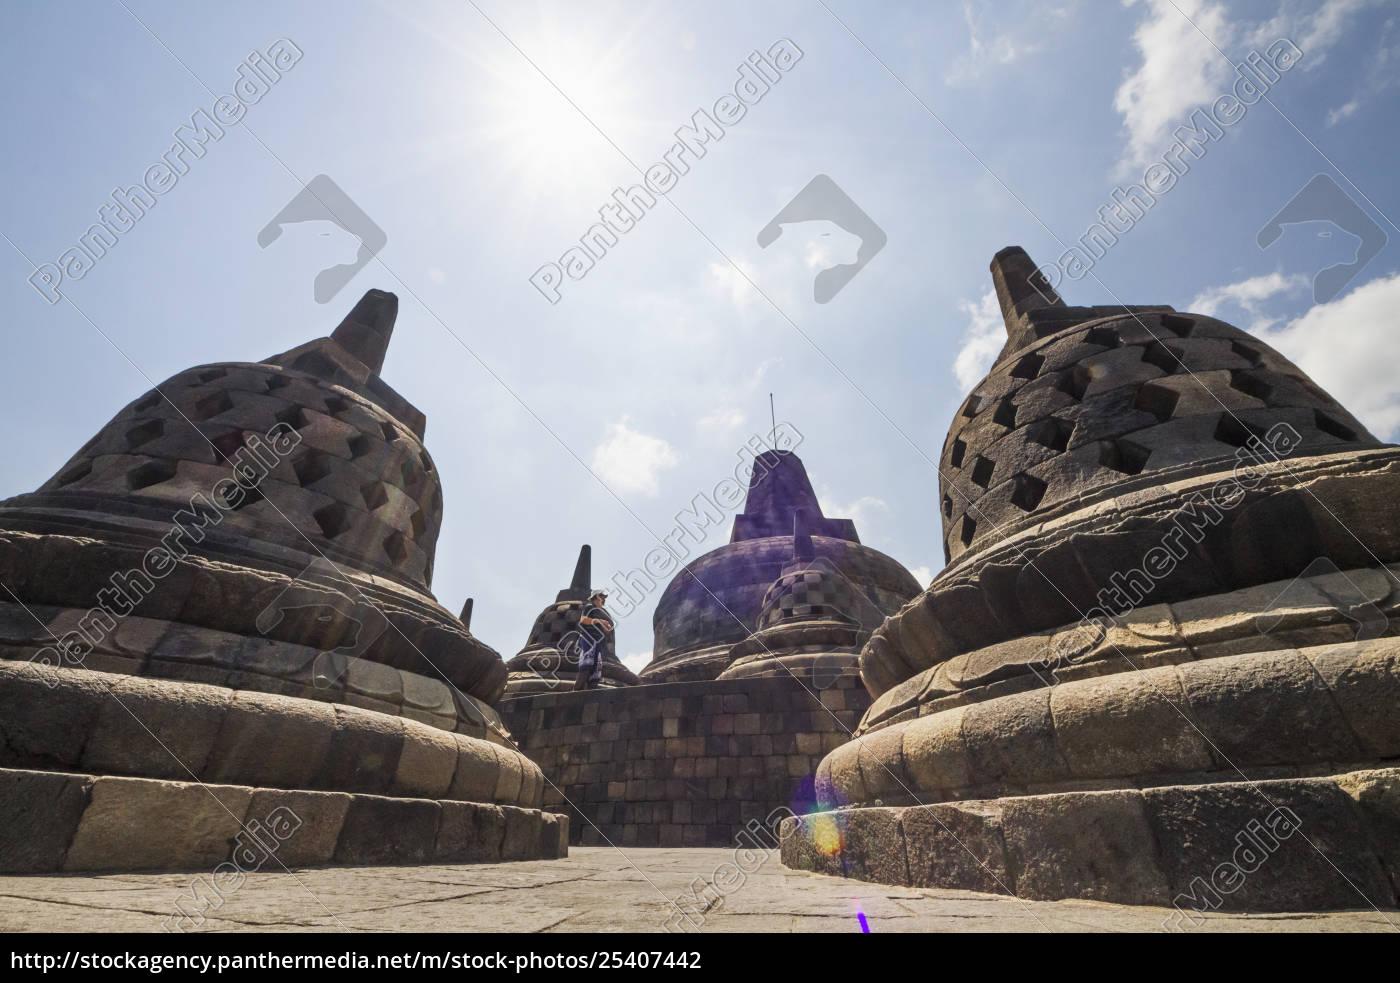 latticed, stone, stupas, containing, buddha, statues - 25407442